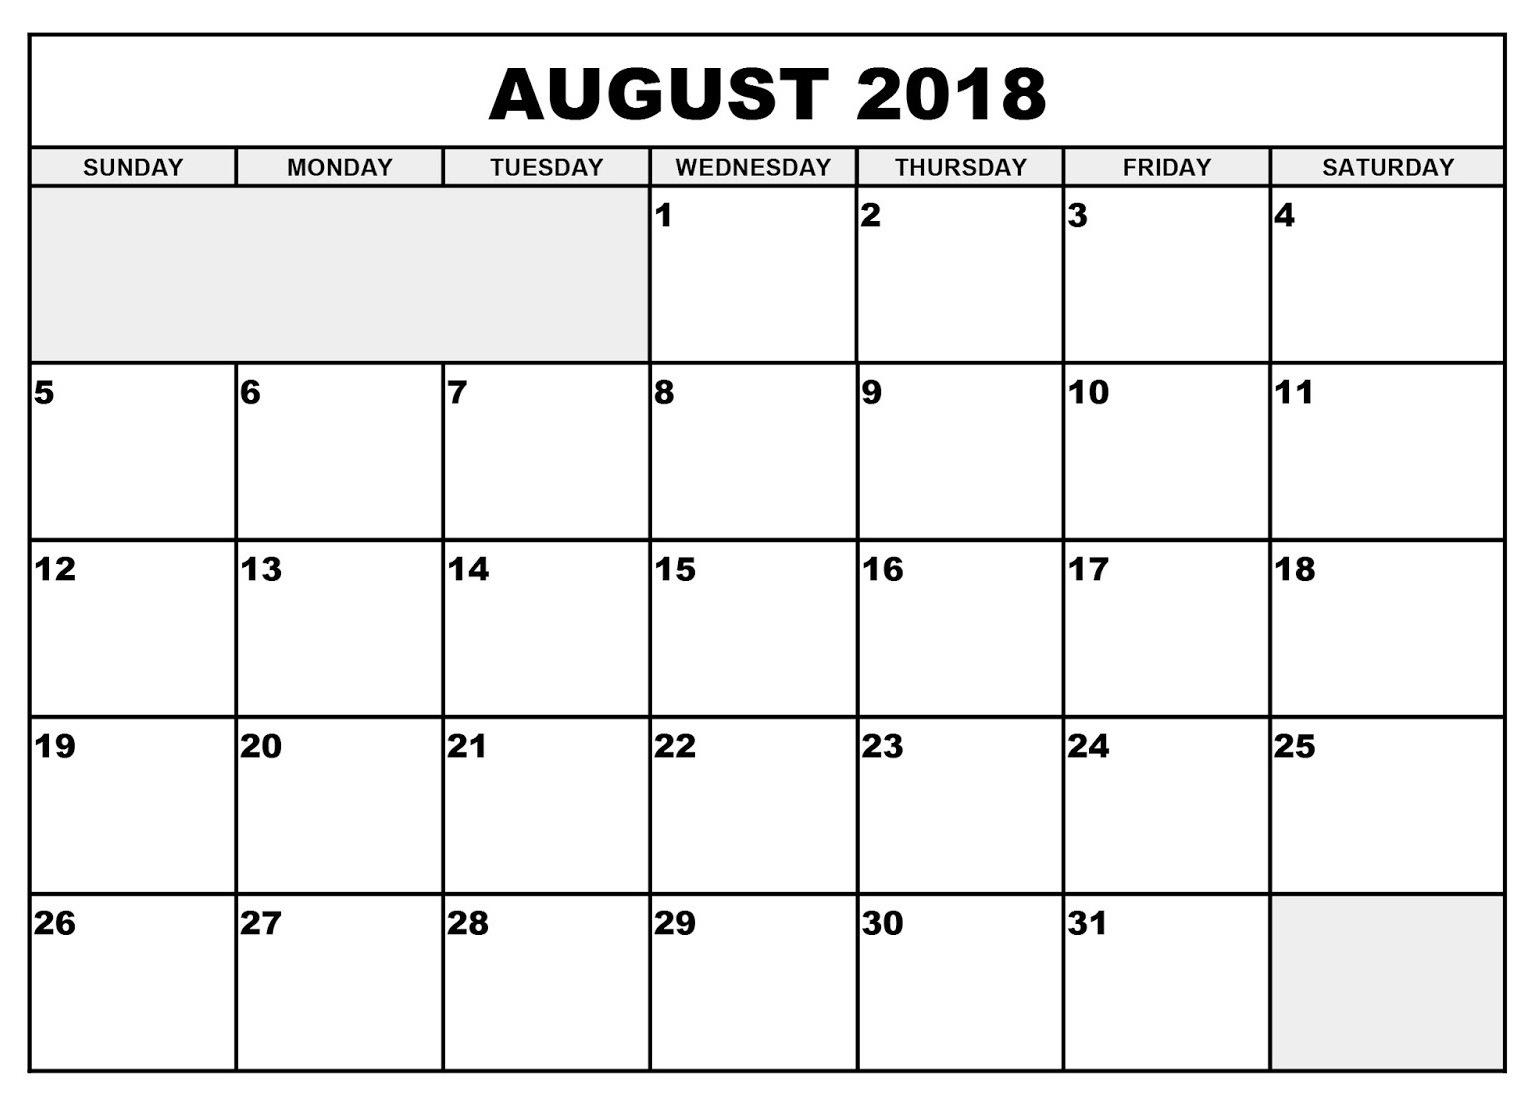 free printable august 2018 calendar calendar printable with Calendar August 2018 Printable Free erdferdf